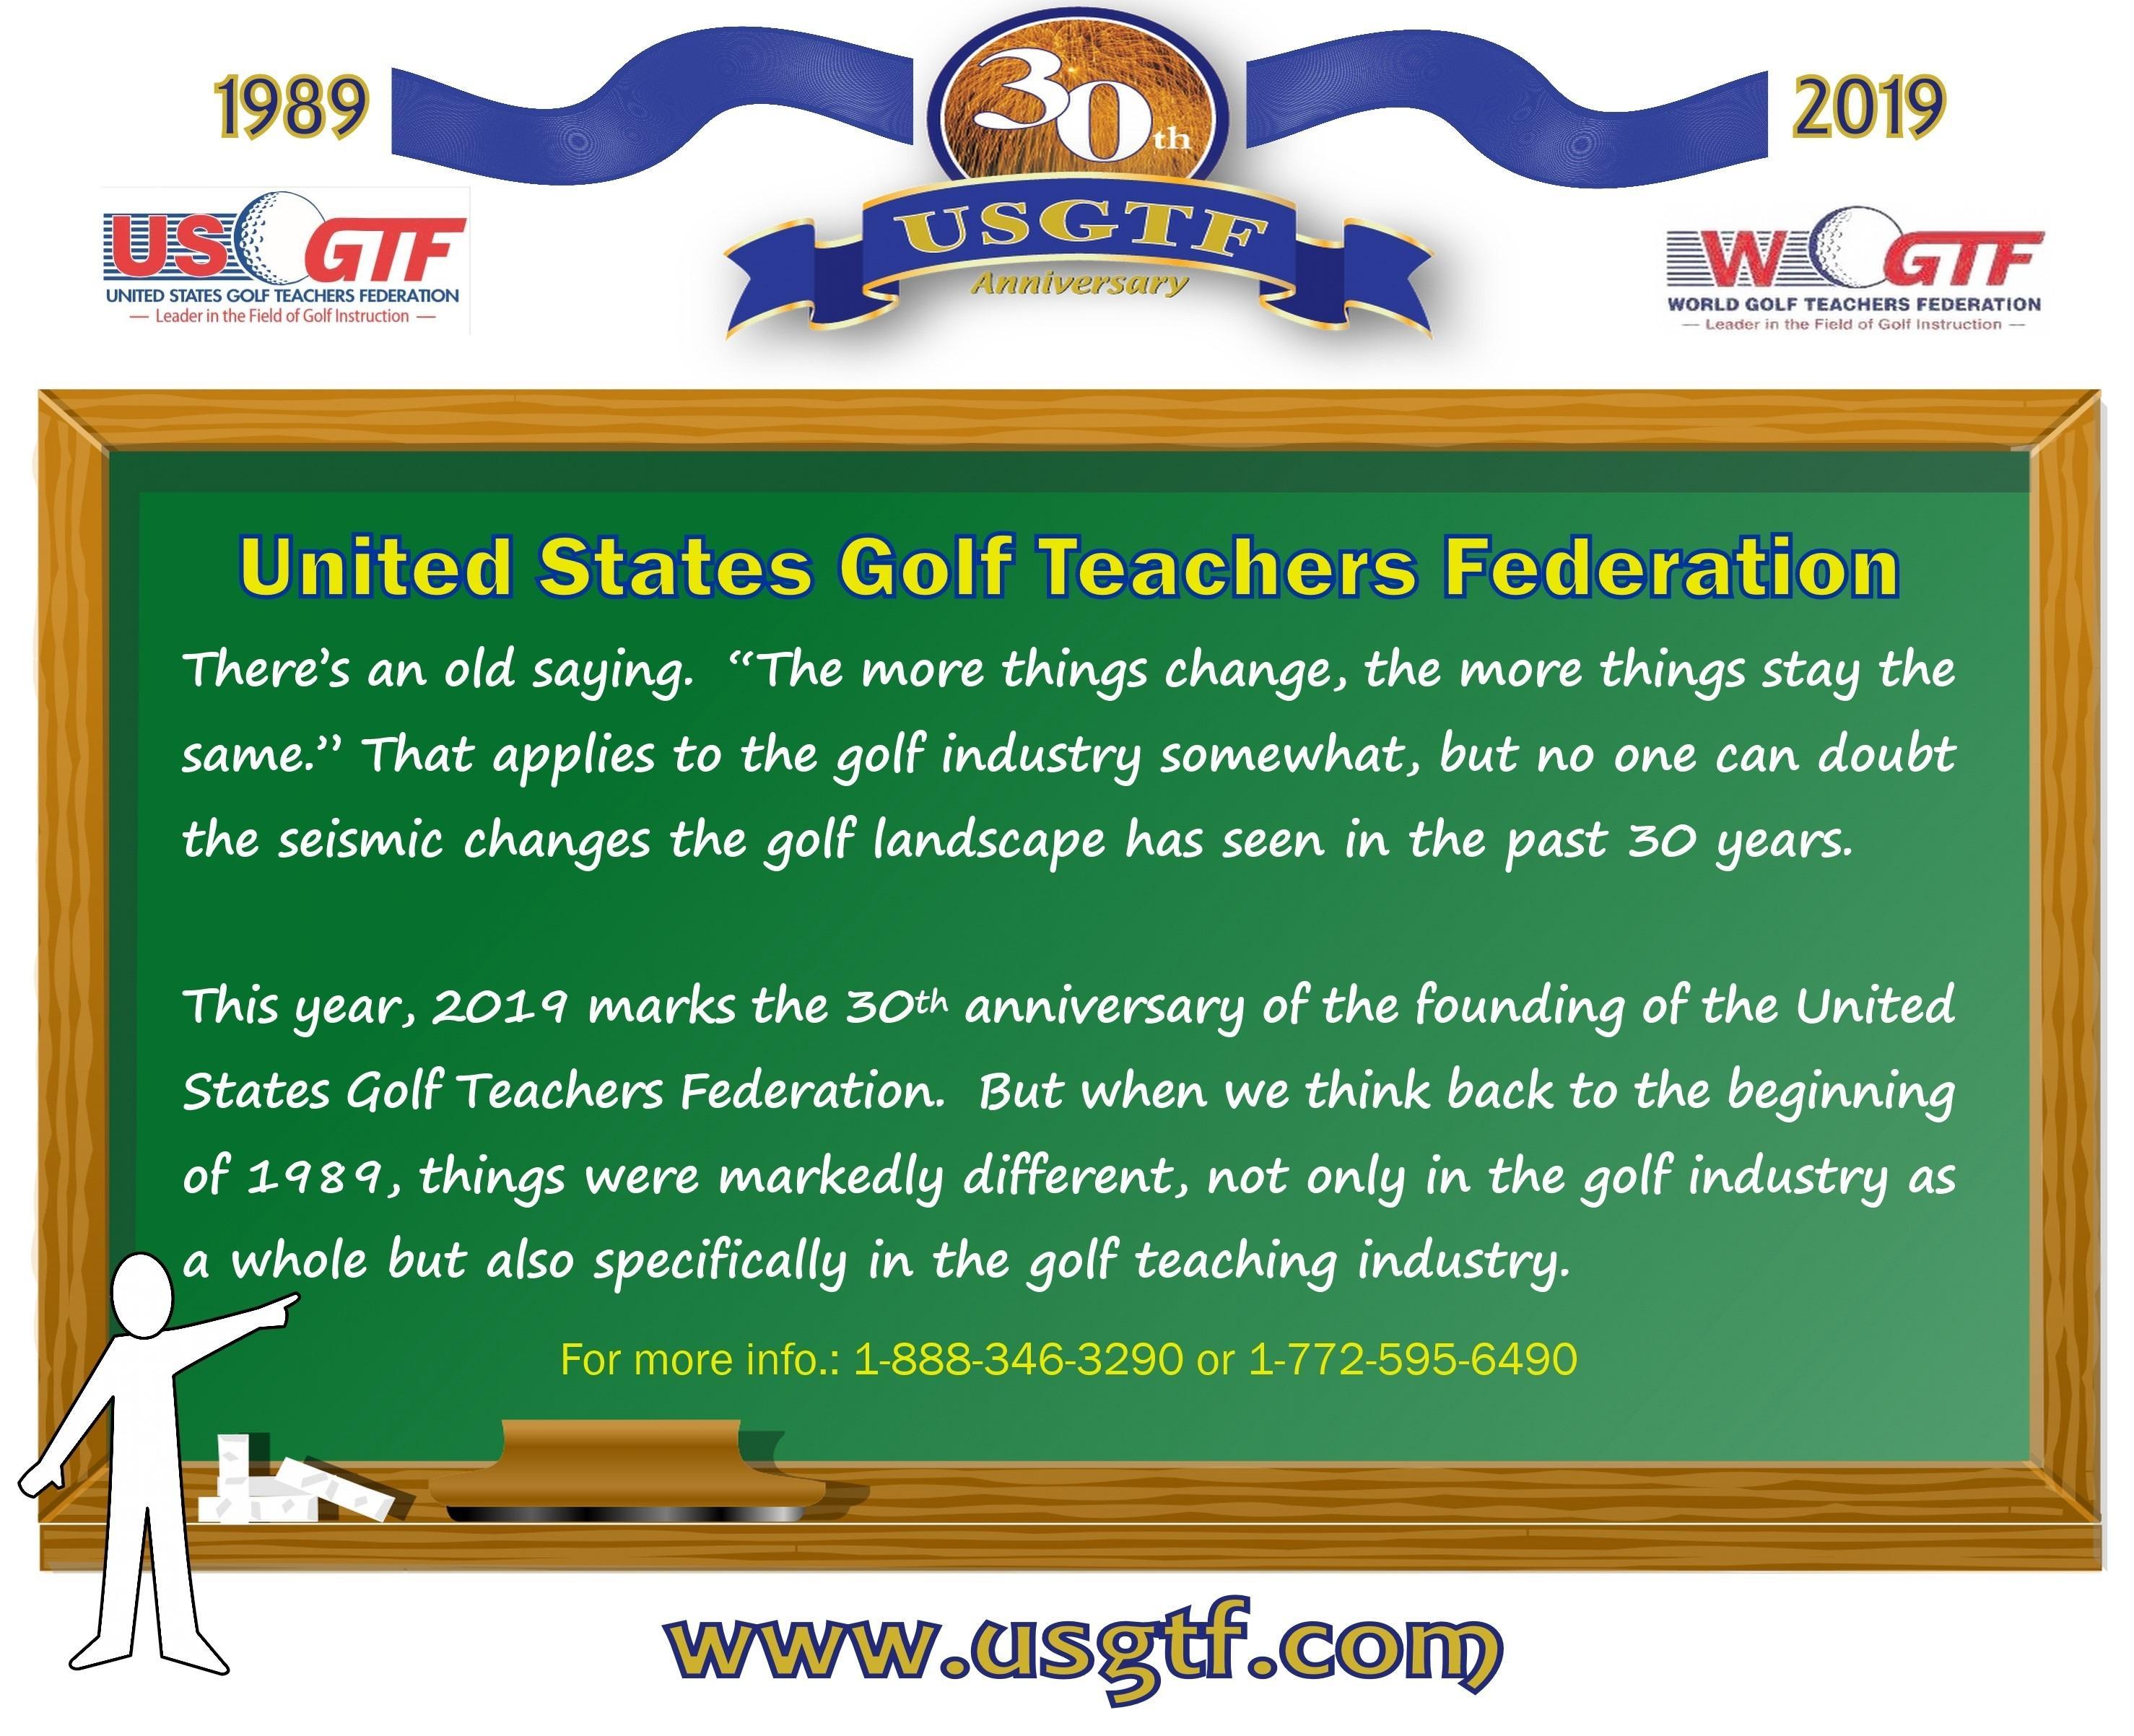 United States Golf Teachers Federation image 0